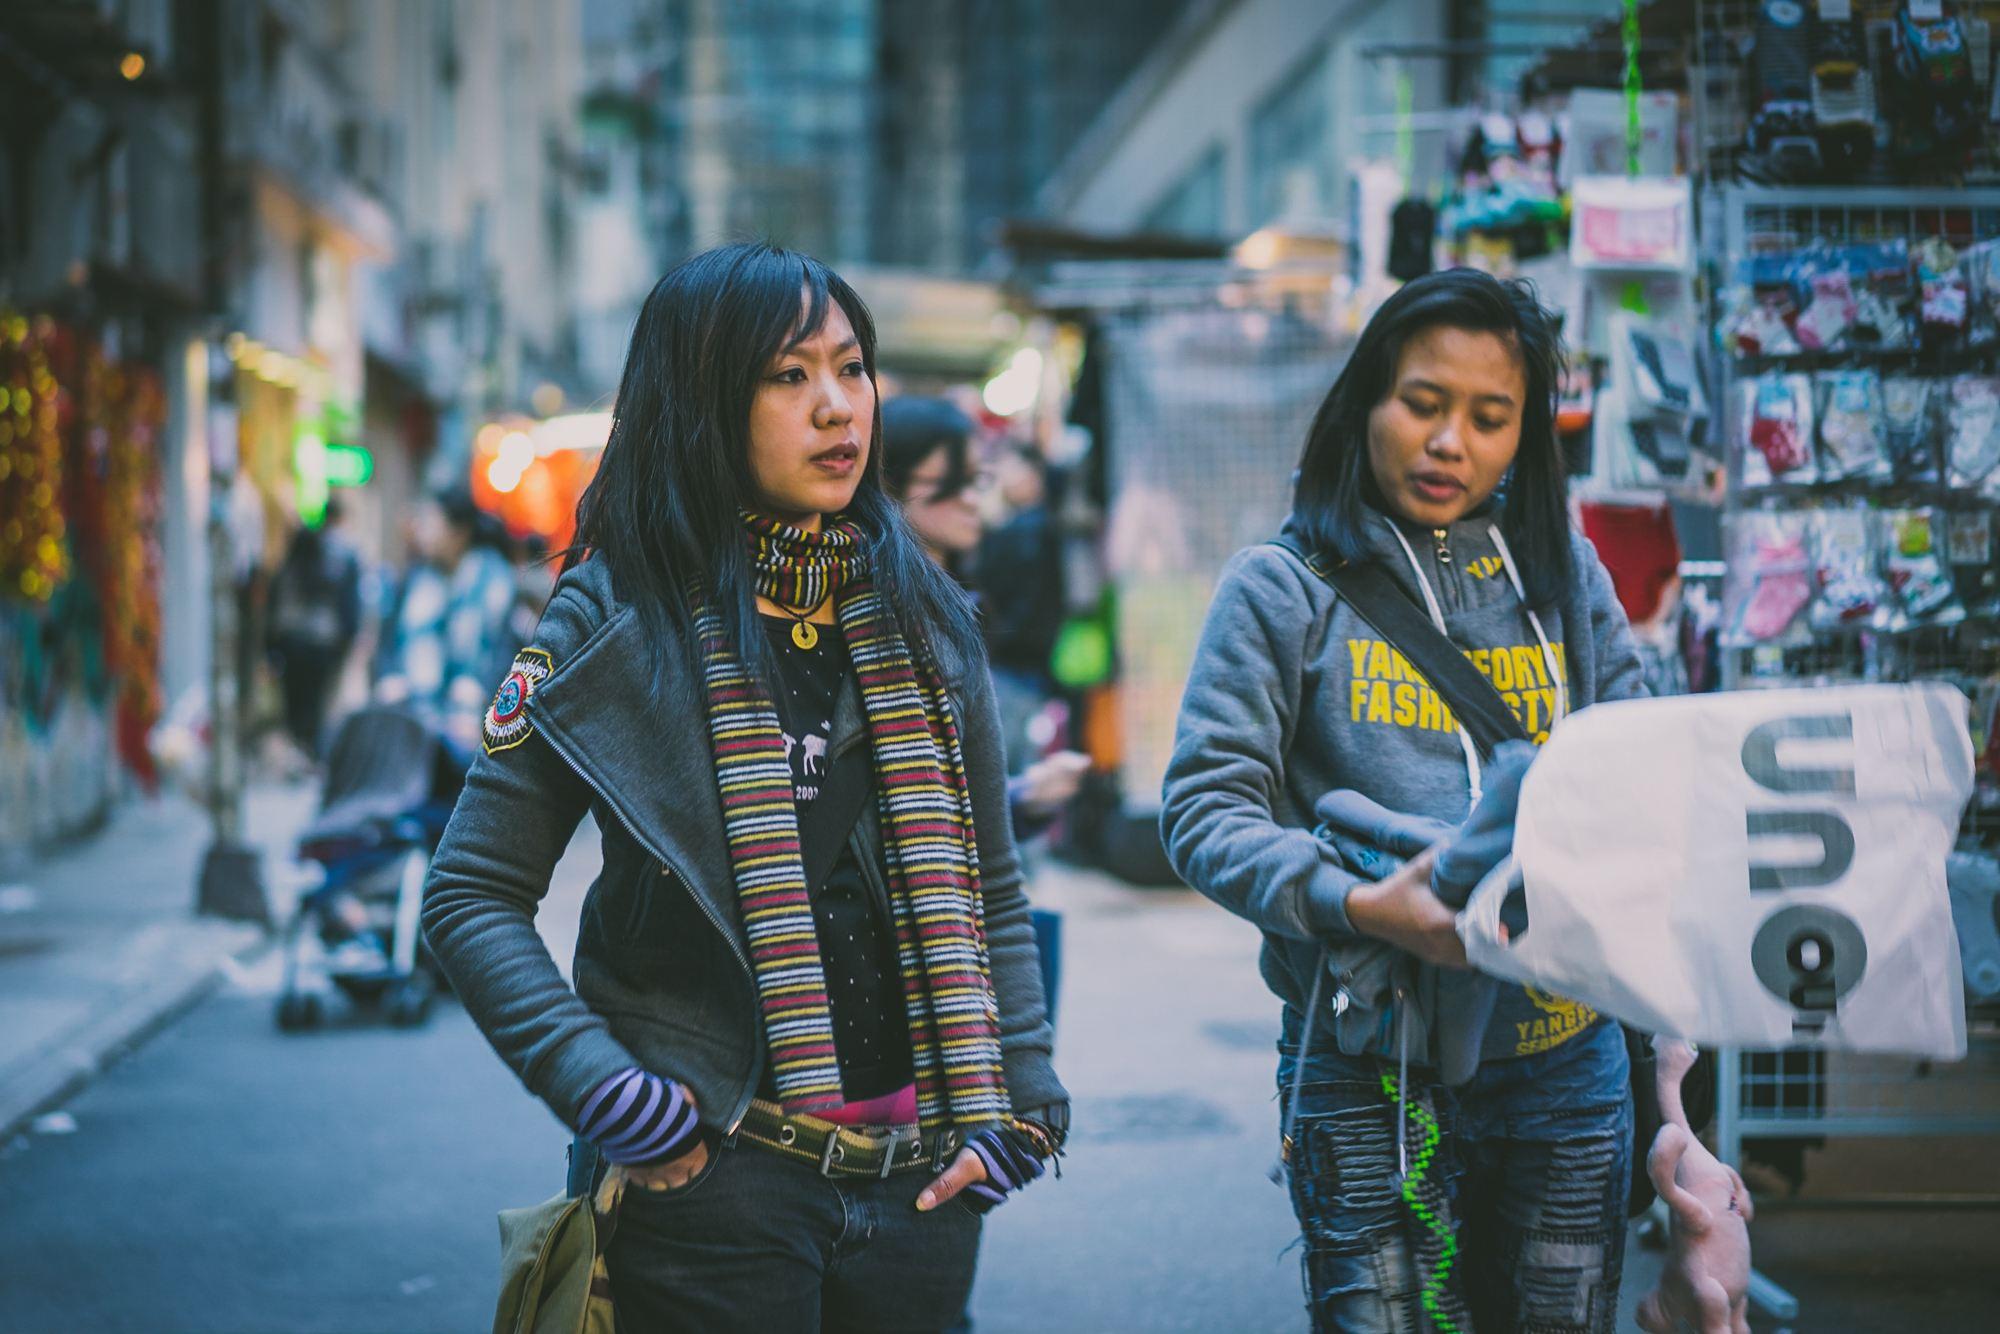 People of Hong Kong